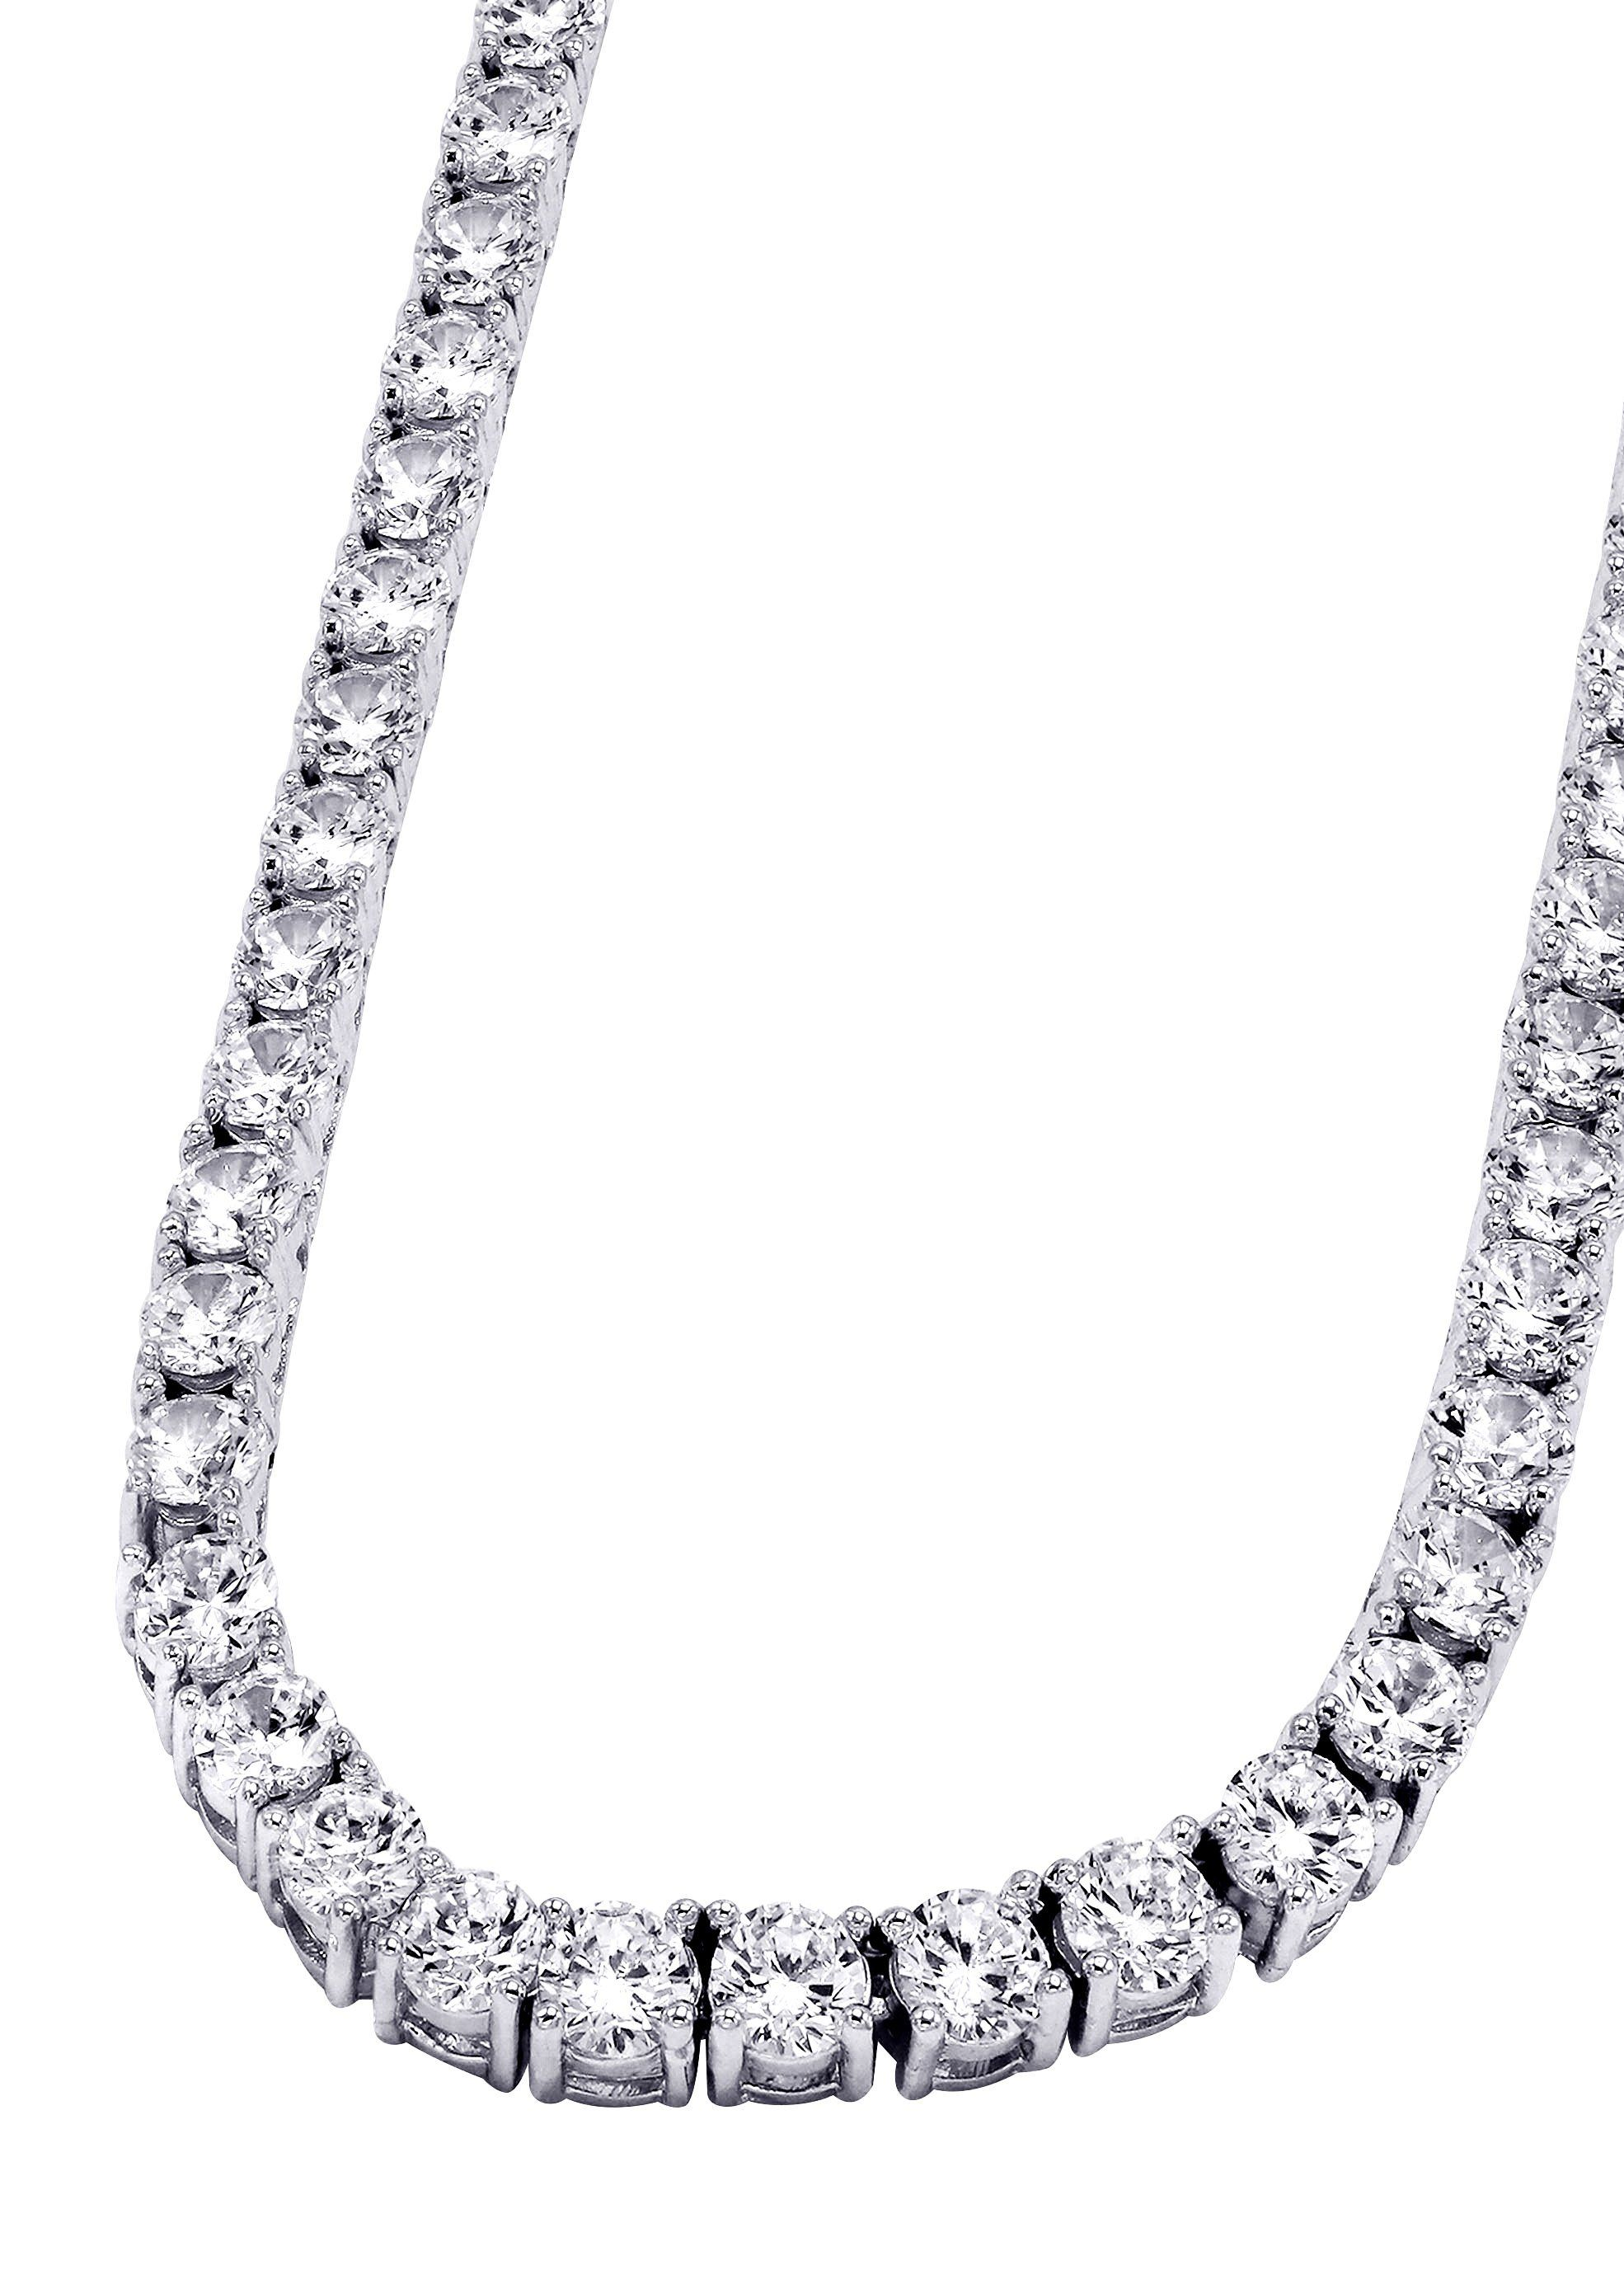 14k White Gold Mens Tennis Chain Diamond Chains For Men Mens Diamond Necklace 14k White Gold Chain